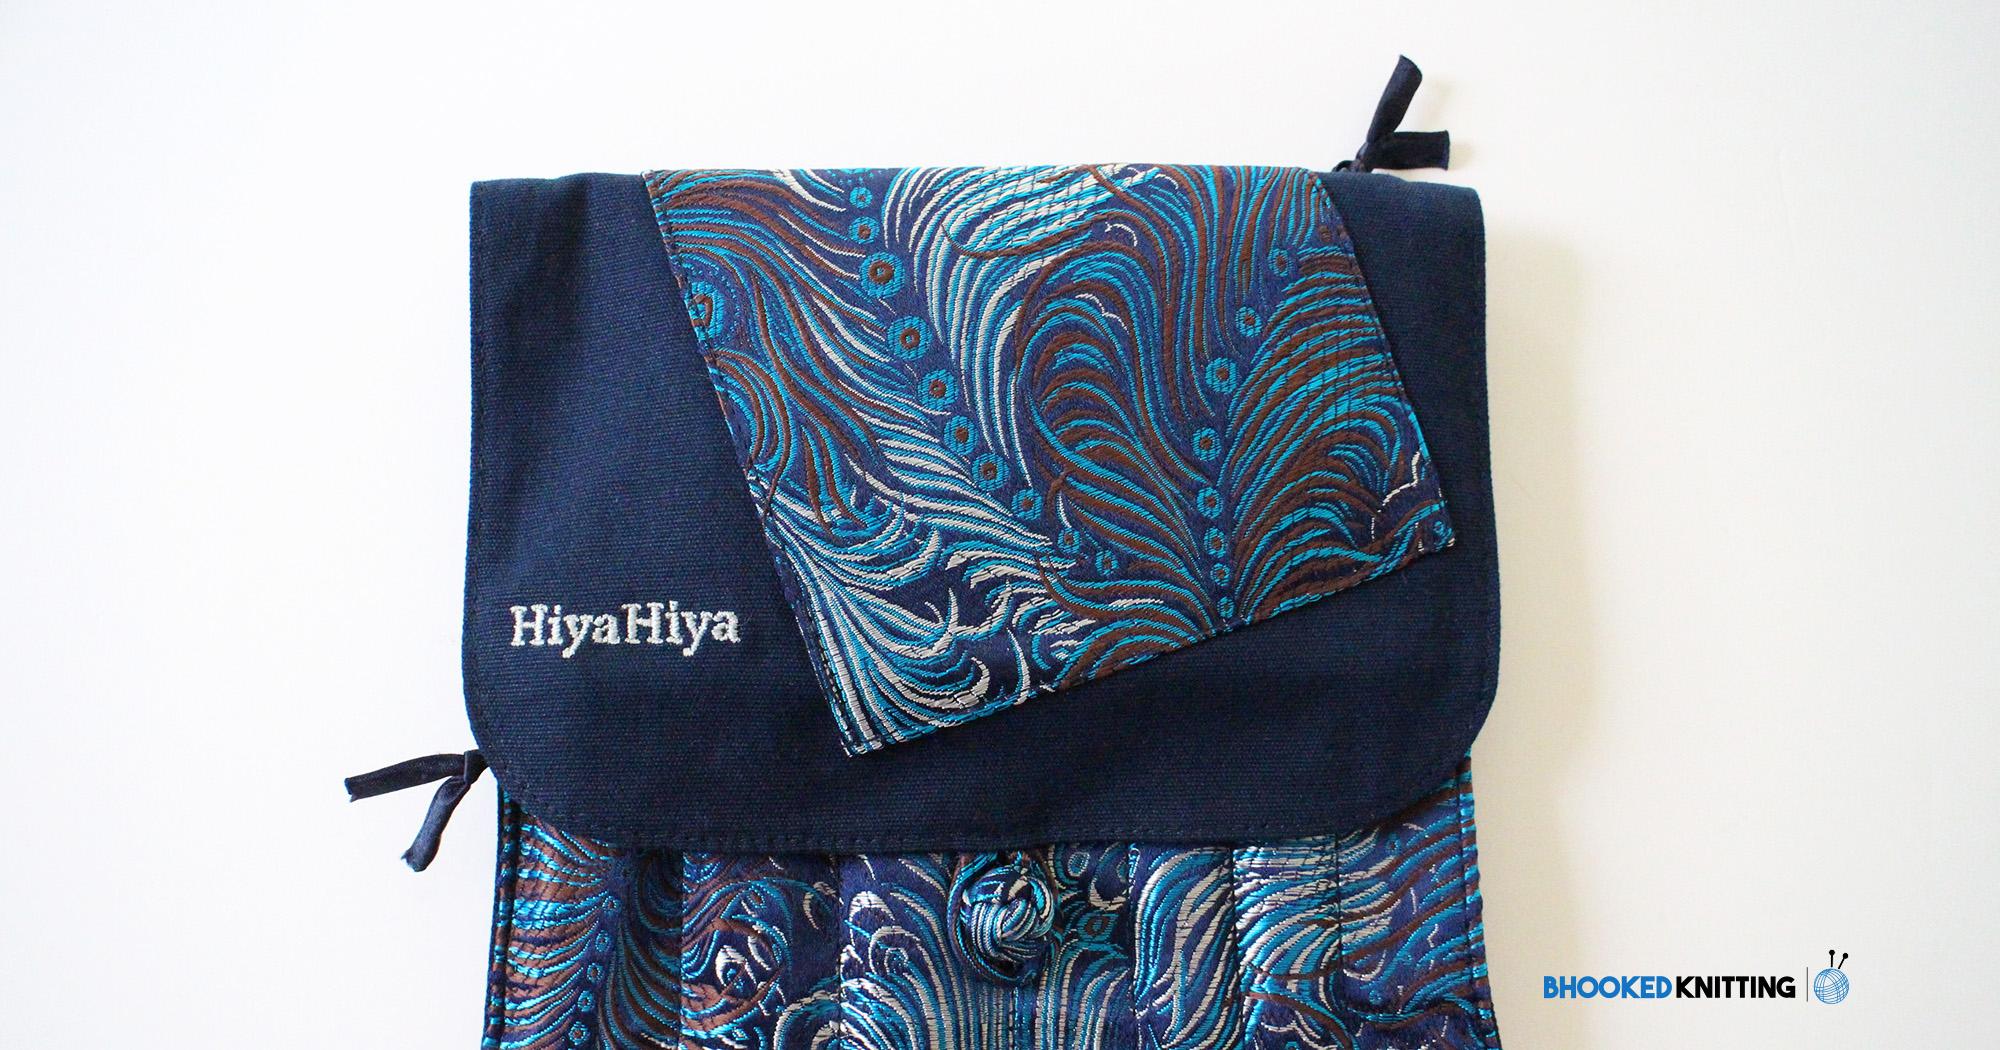 Hiya Hiya Interchangeable Knitting Needles Review